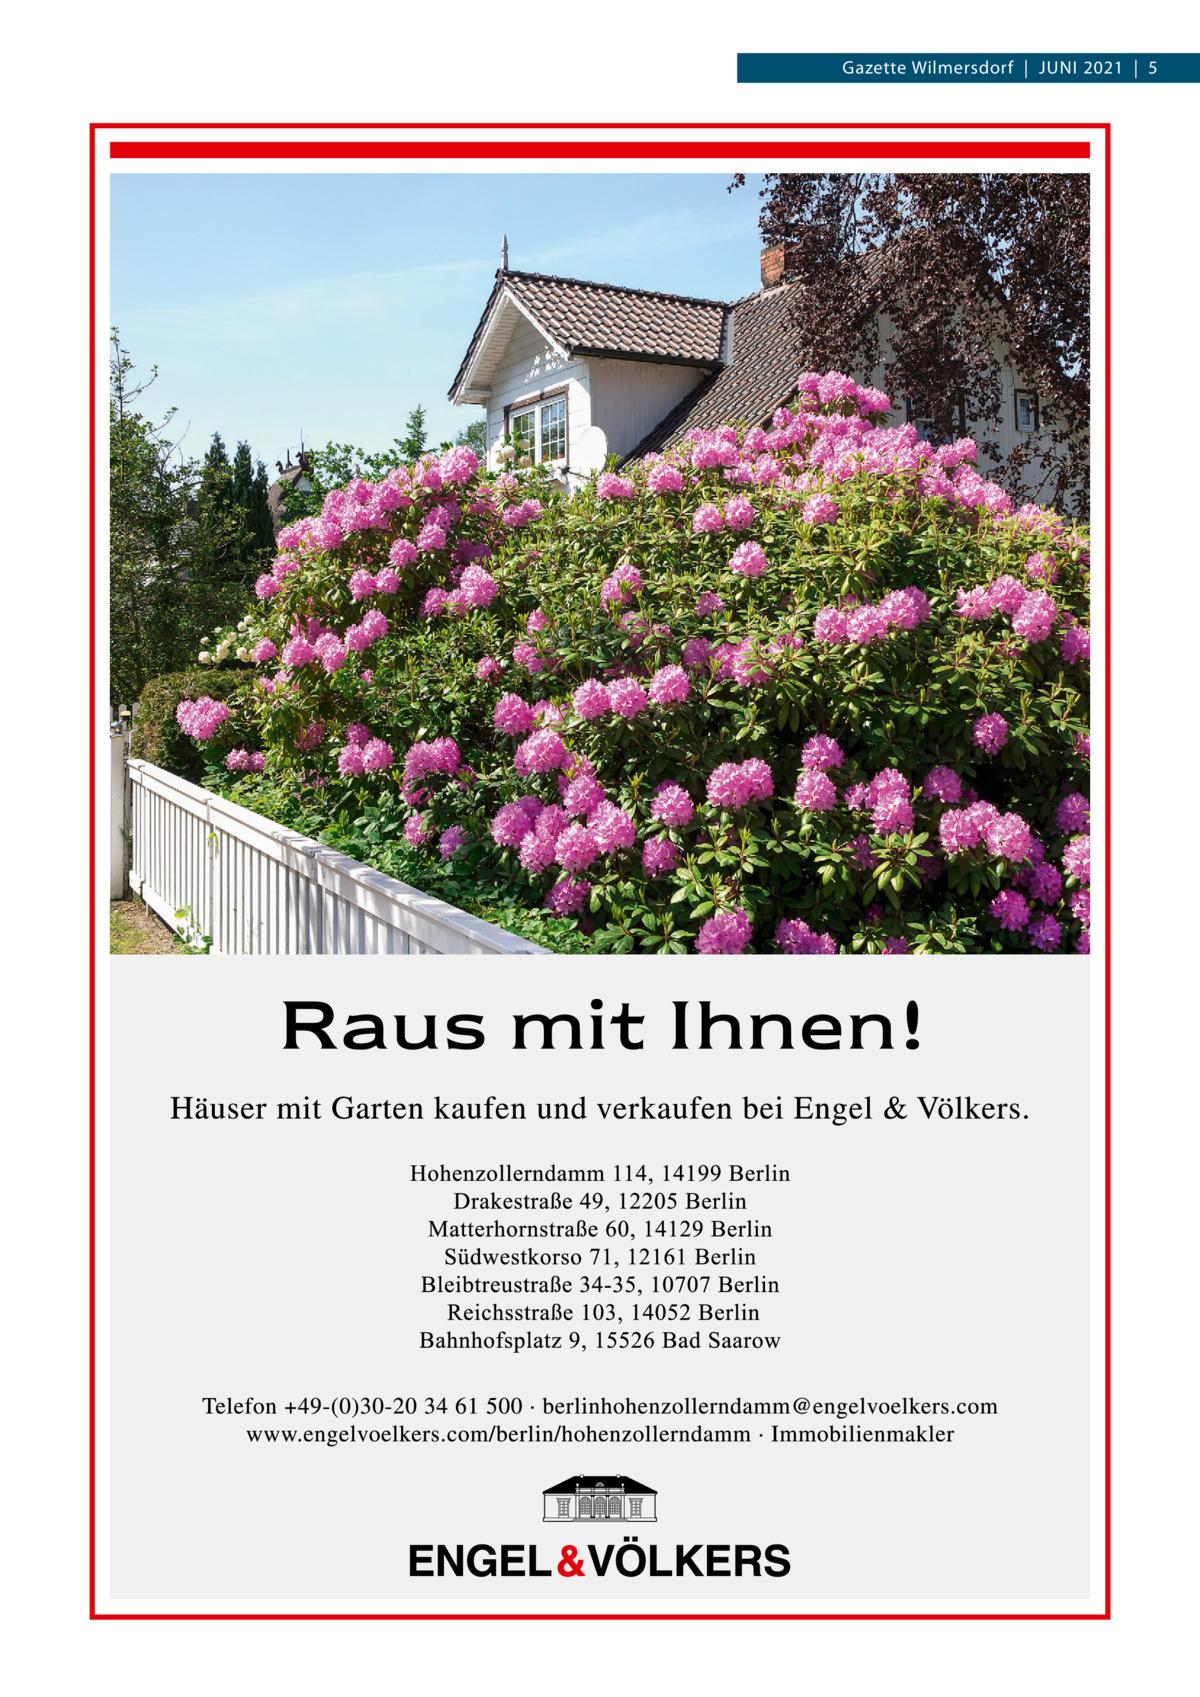 Gazette Wilmersdorf Juni 2021 5